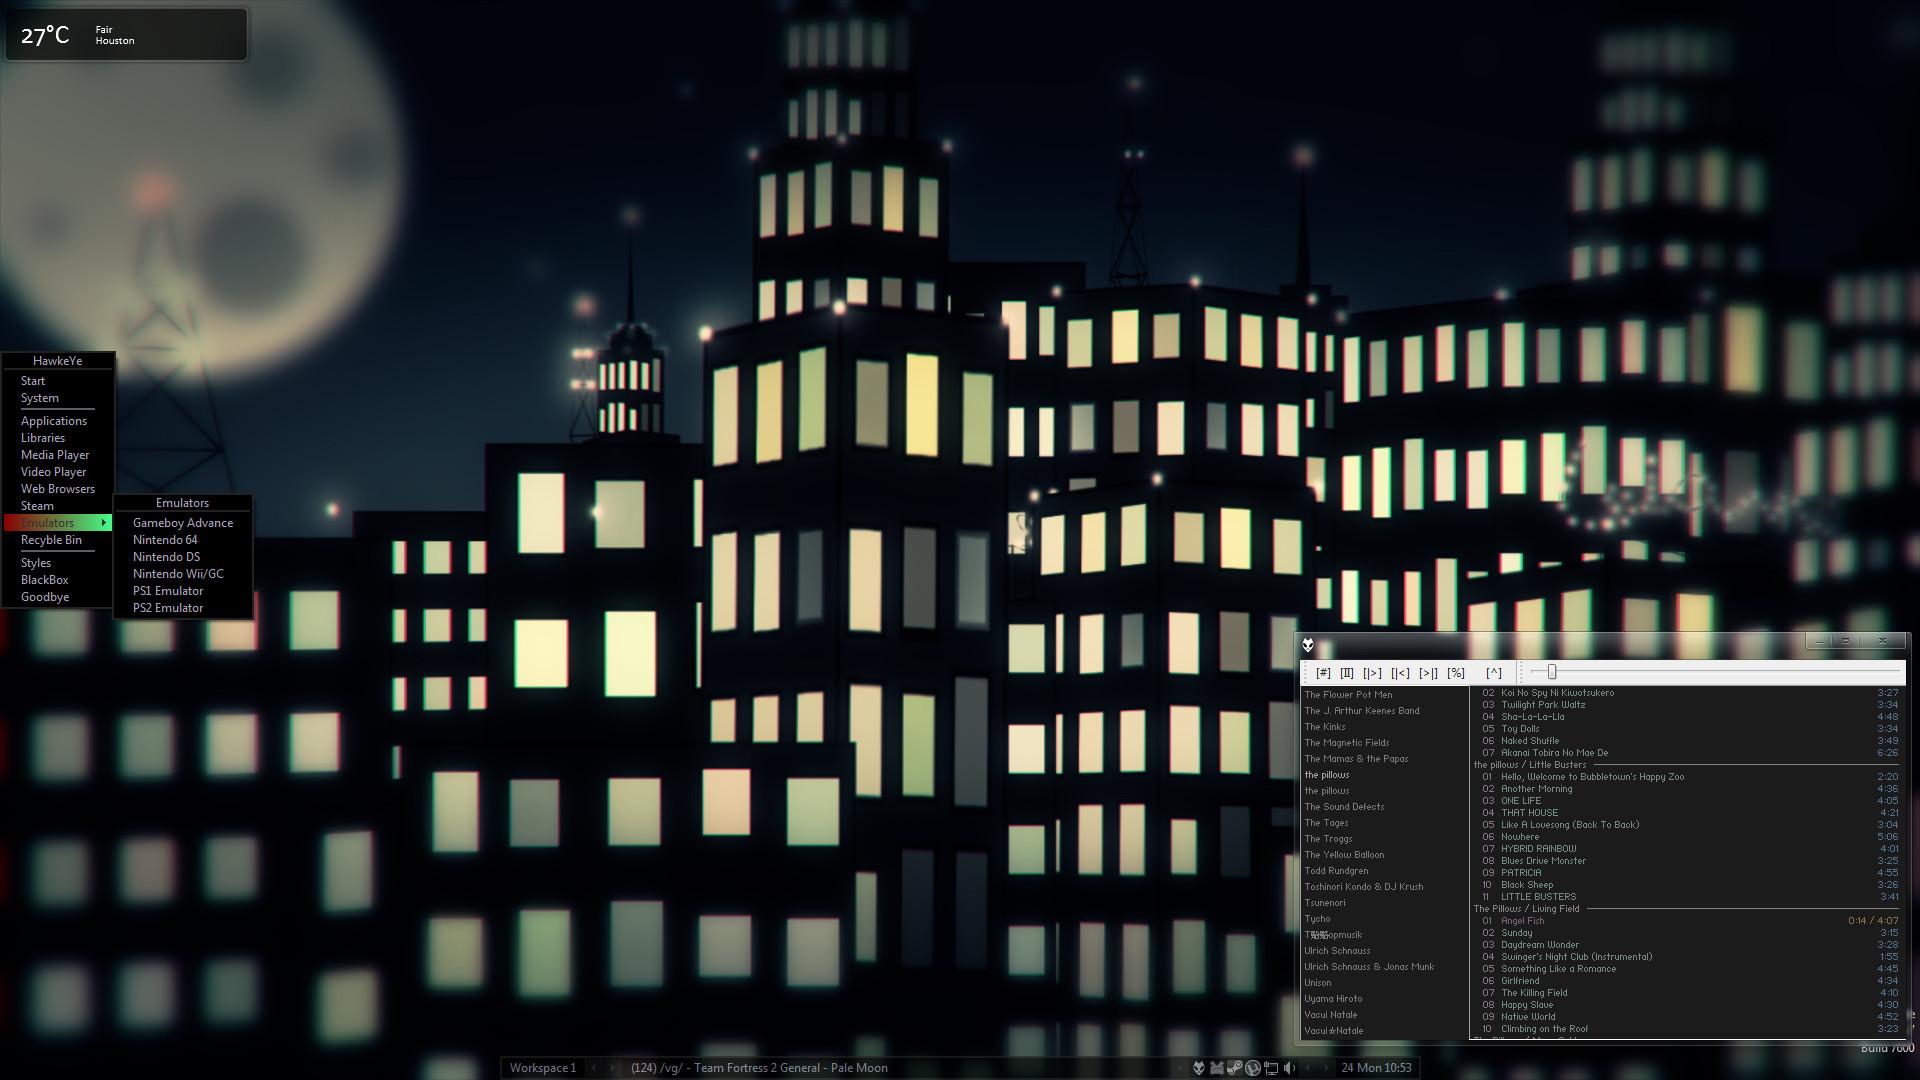 Nighttime City Sykline Desktop by animedeviant7666 Nighttime City Sykline  Desktop by animedeviant7666